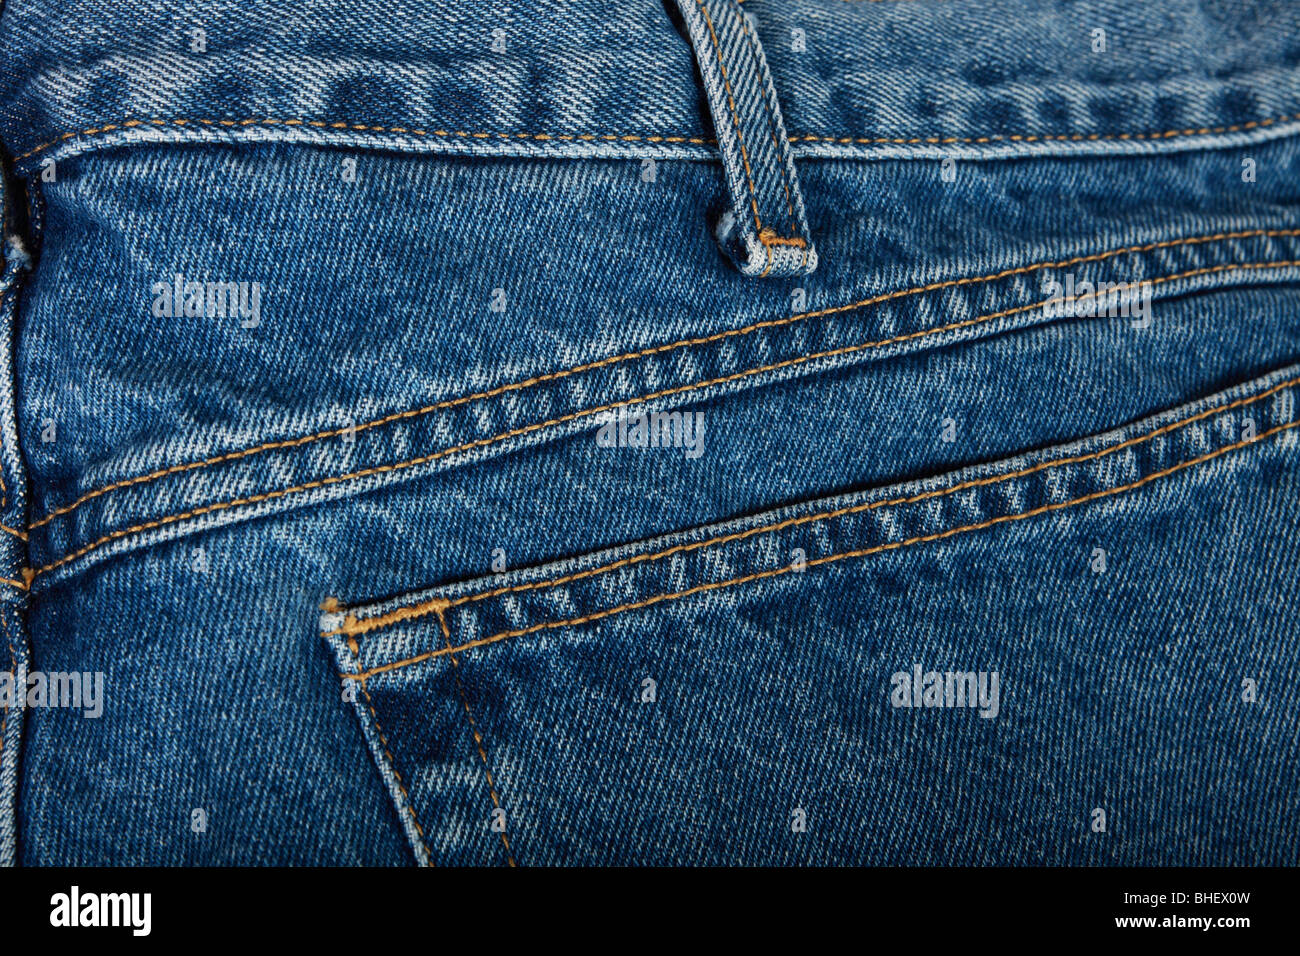 a closeup of stitched denim blue jeans stock photo 27987257 alamy